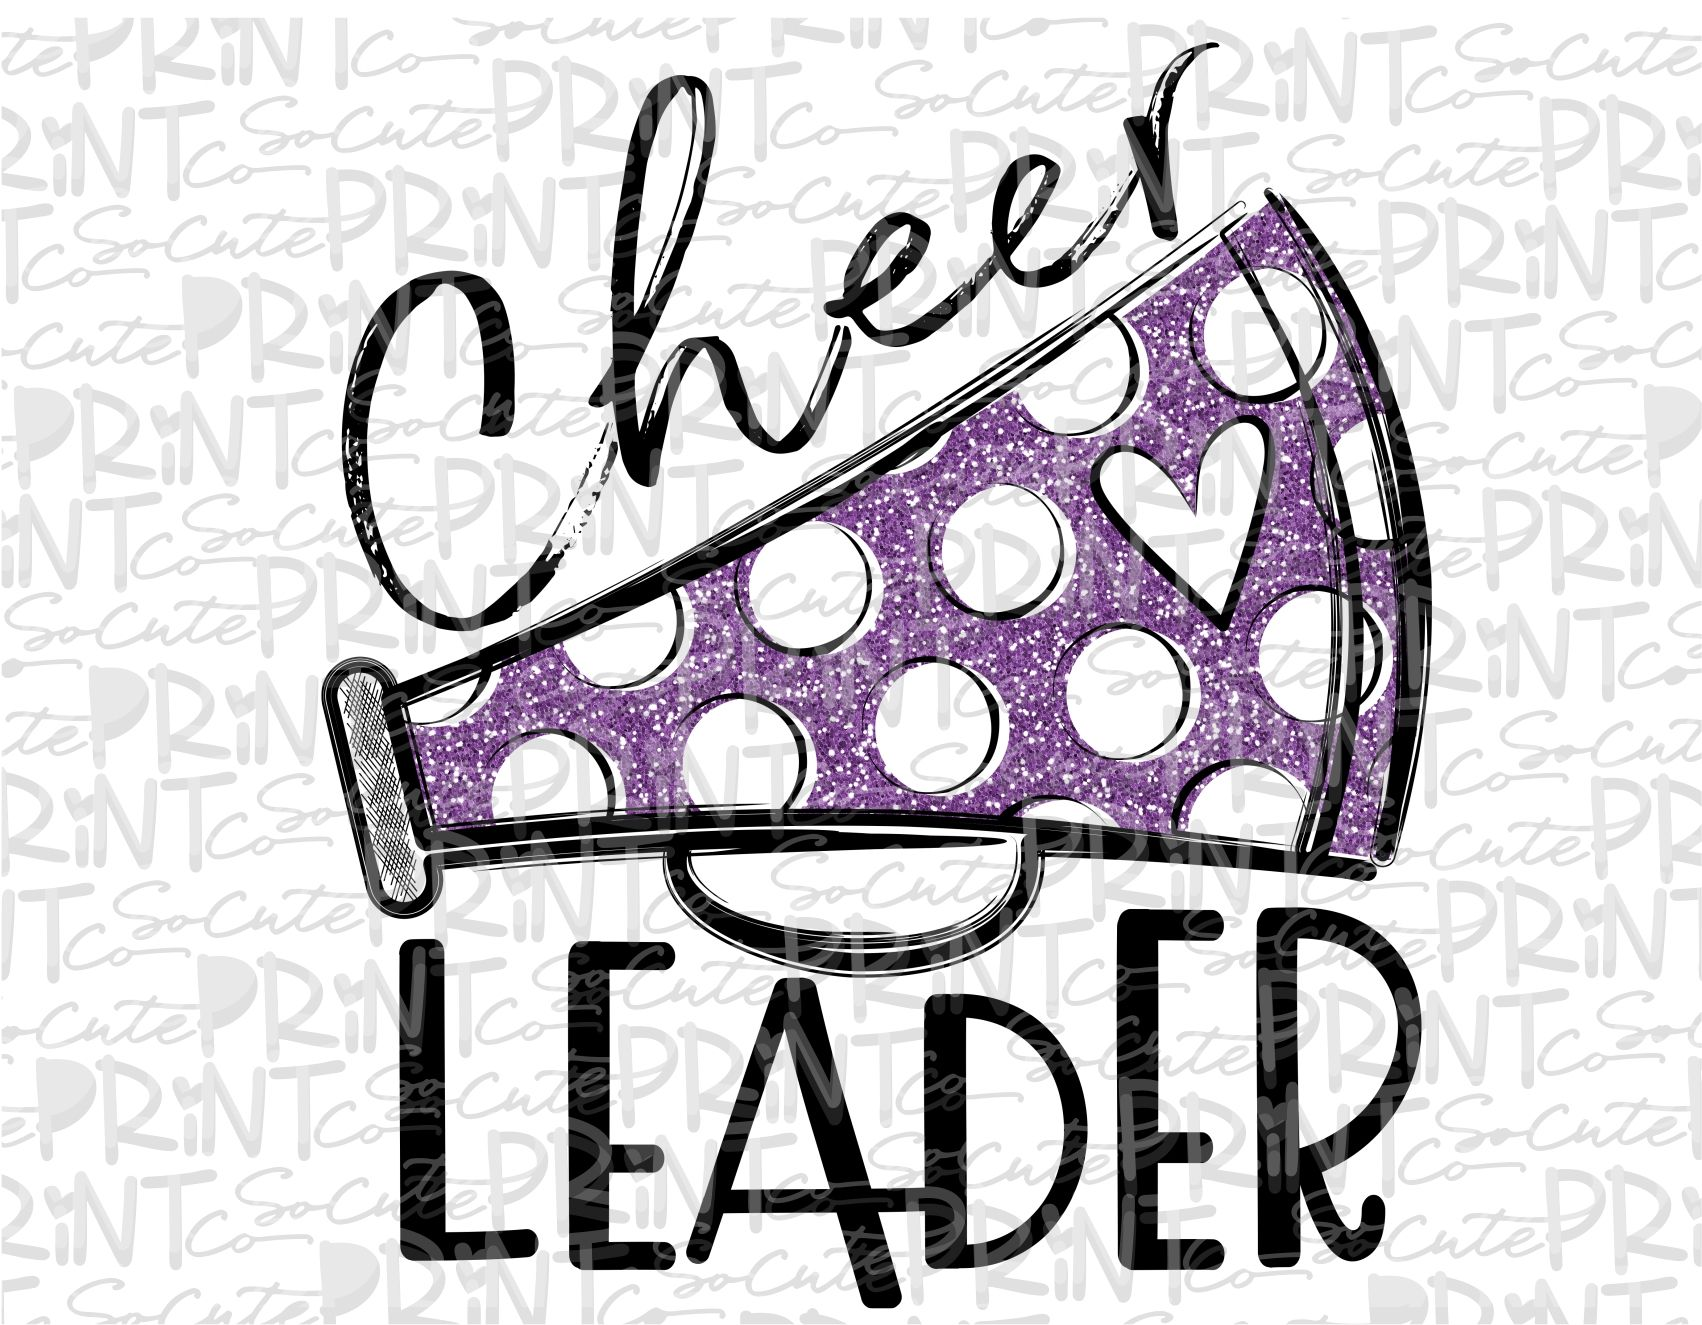 Purple cheerleader clipart graphic royalty free library cheer leader purple glitter *Printable PNG | Watercolor ... graphic royalty free library